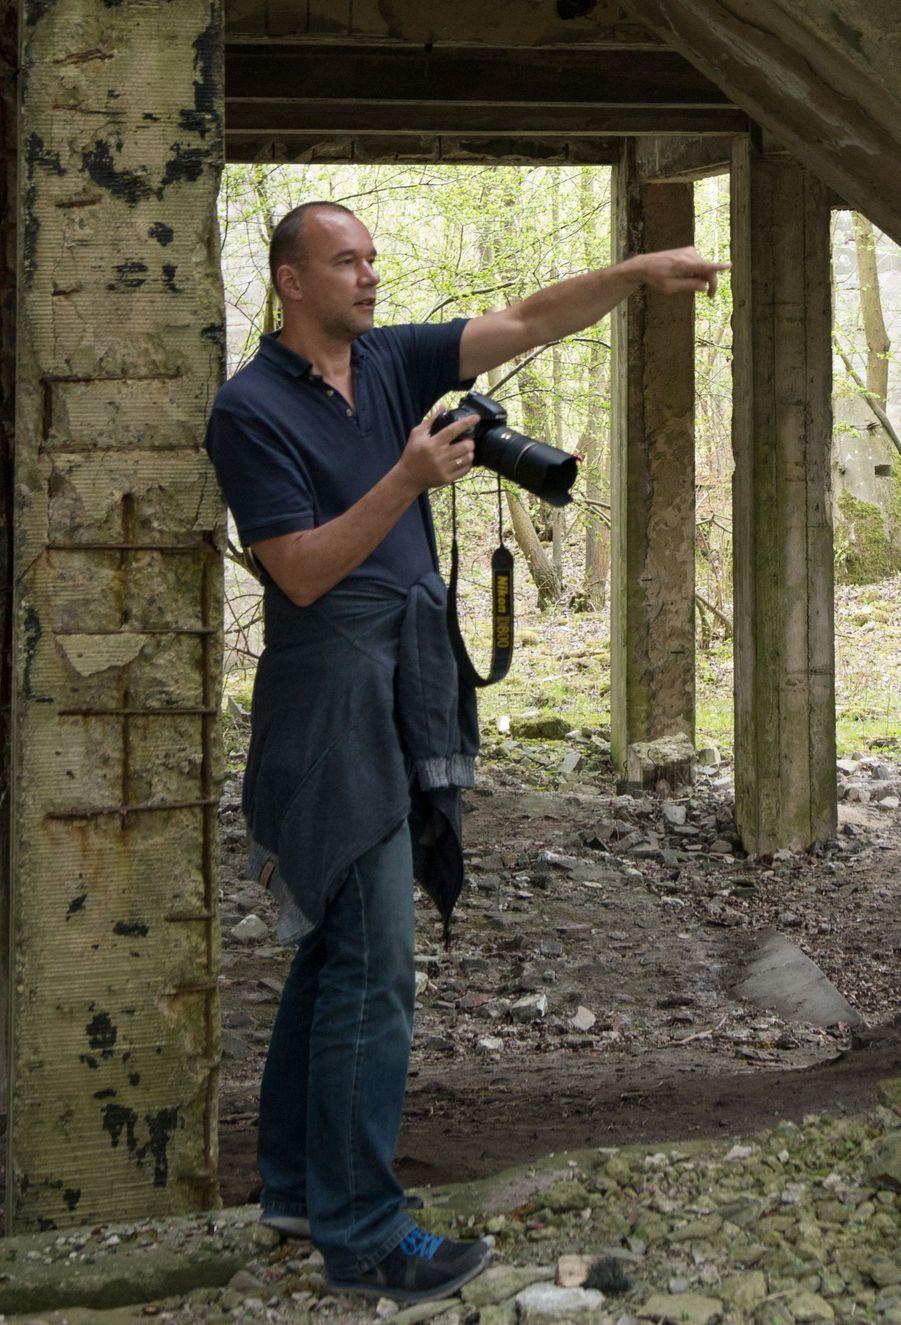 Le photographe Lars Krux